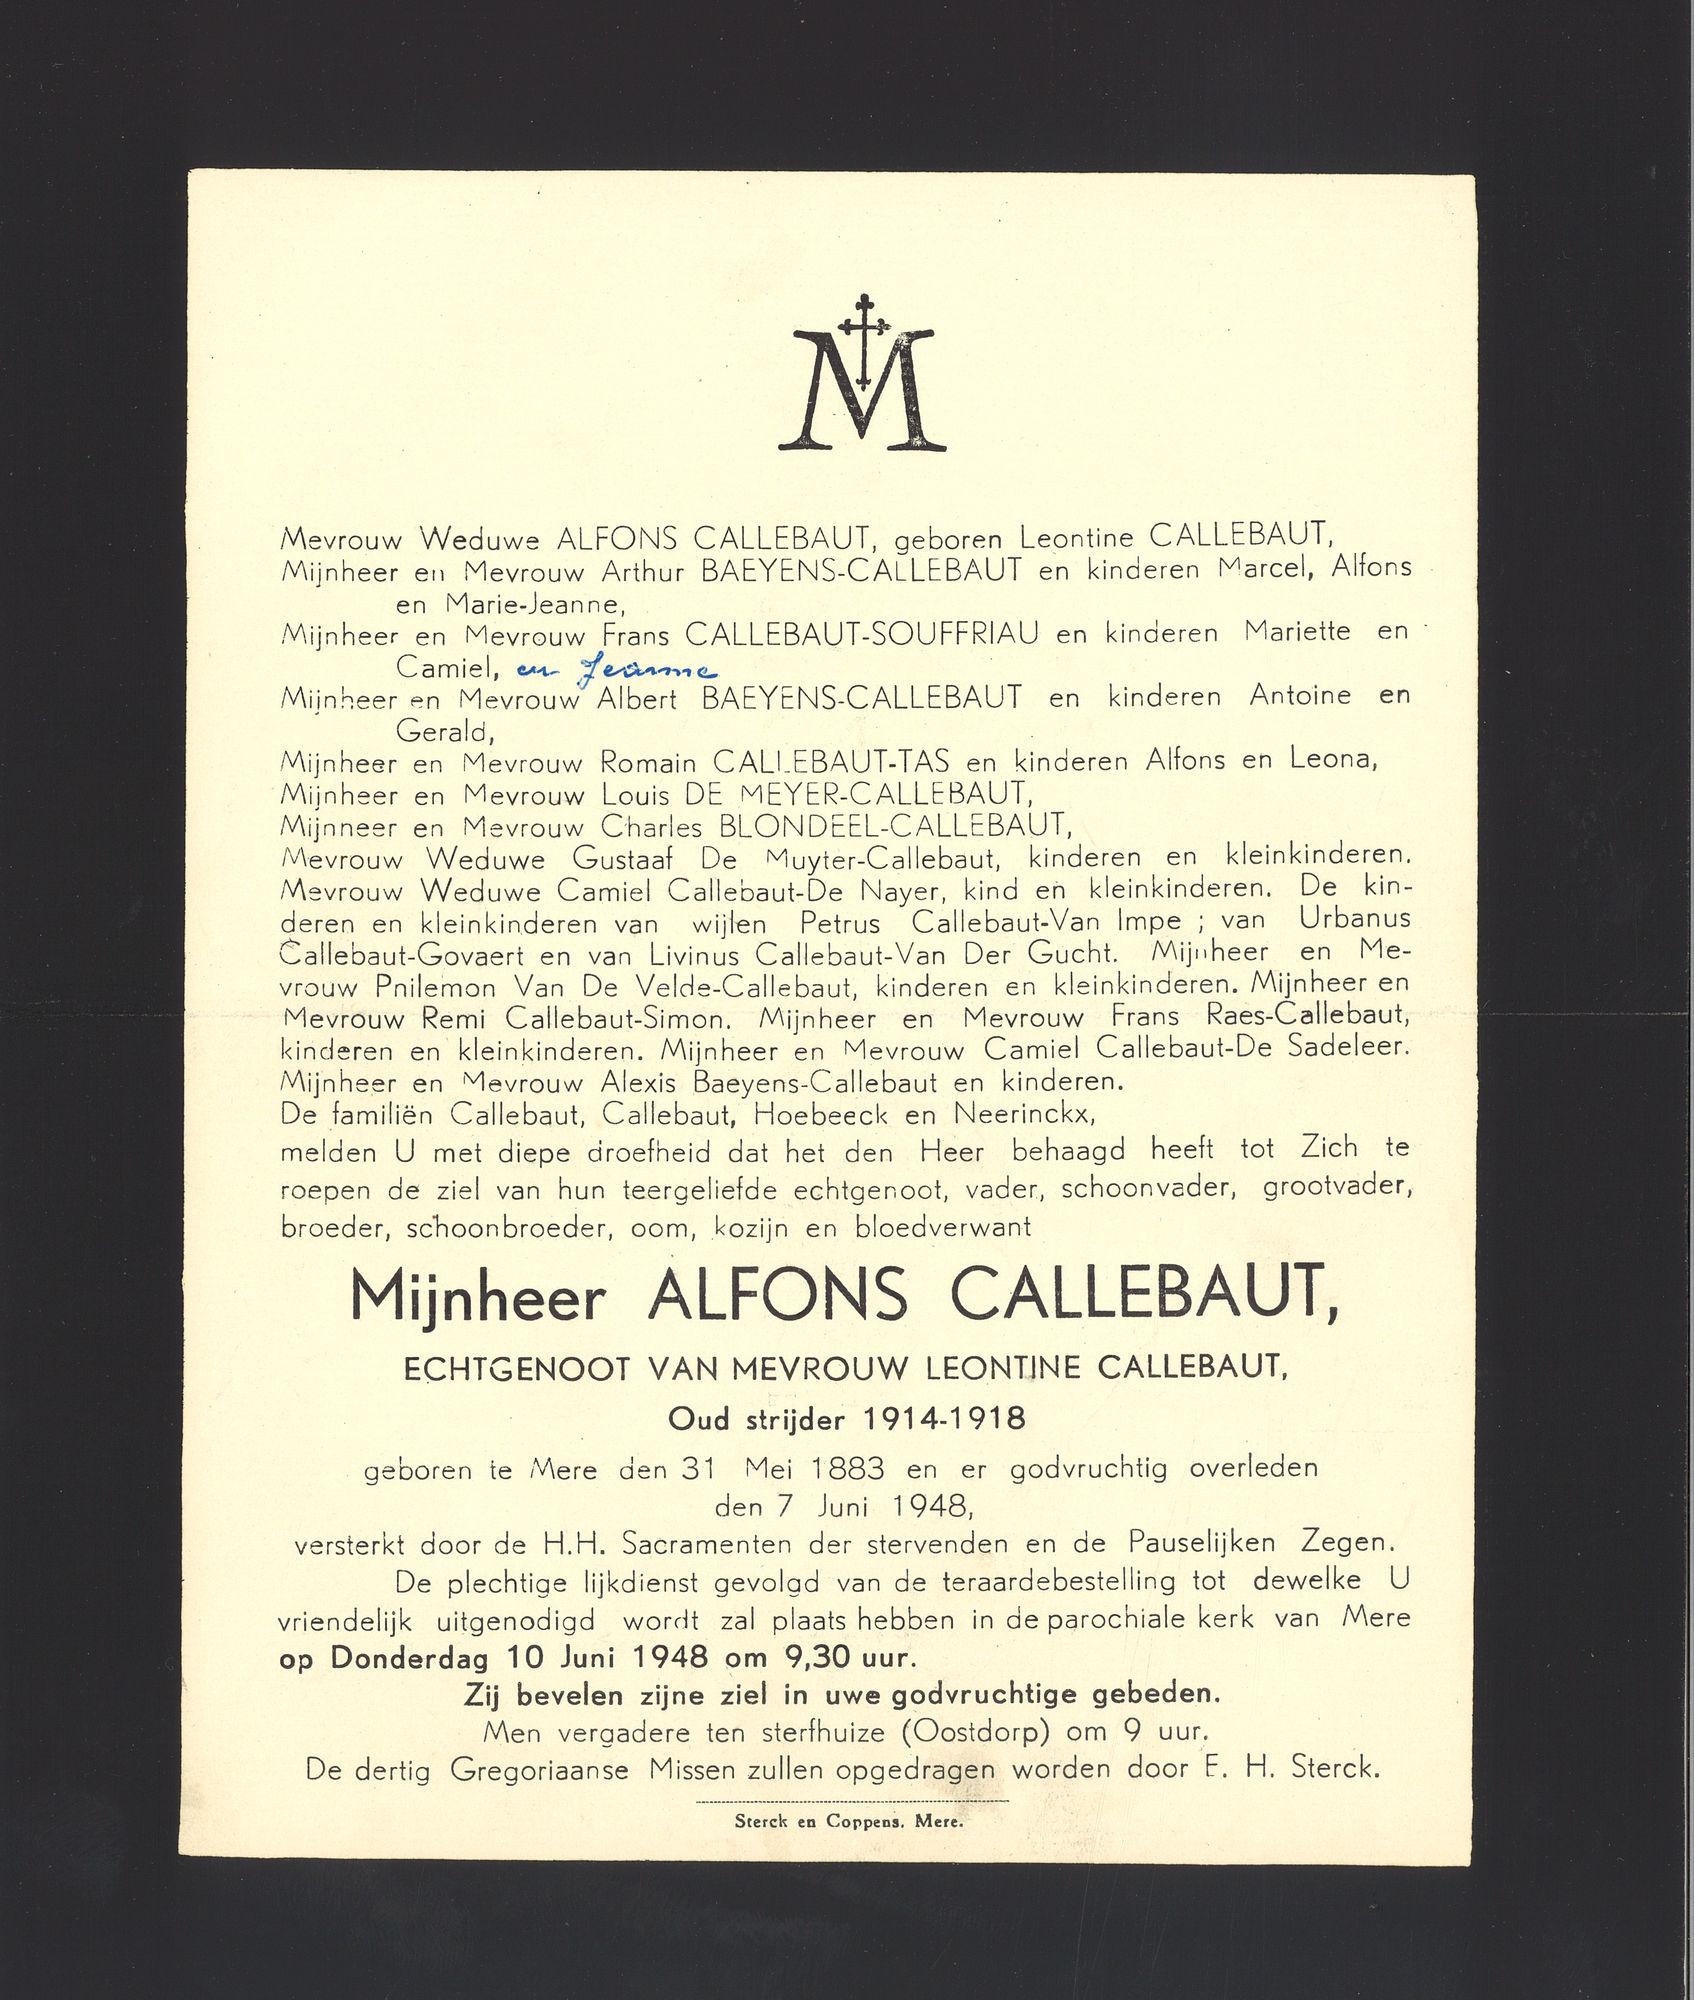 Callebaut Alfons